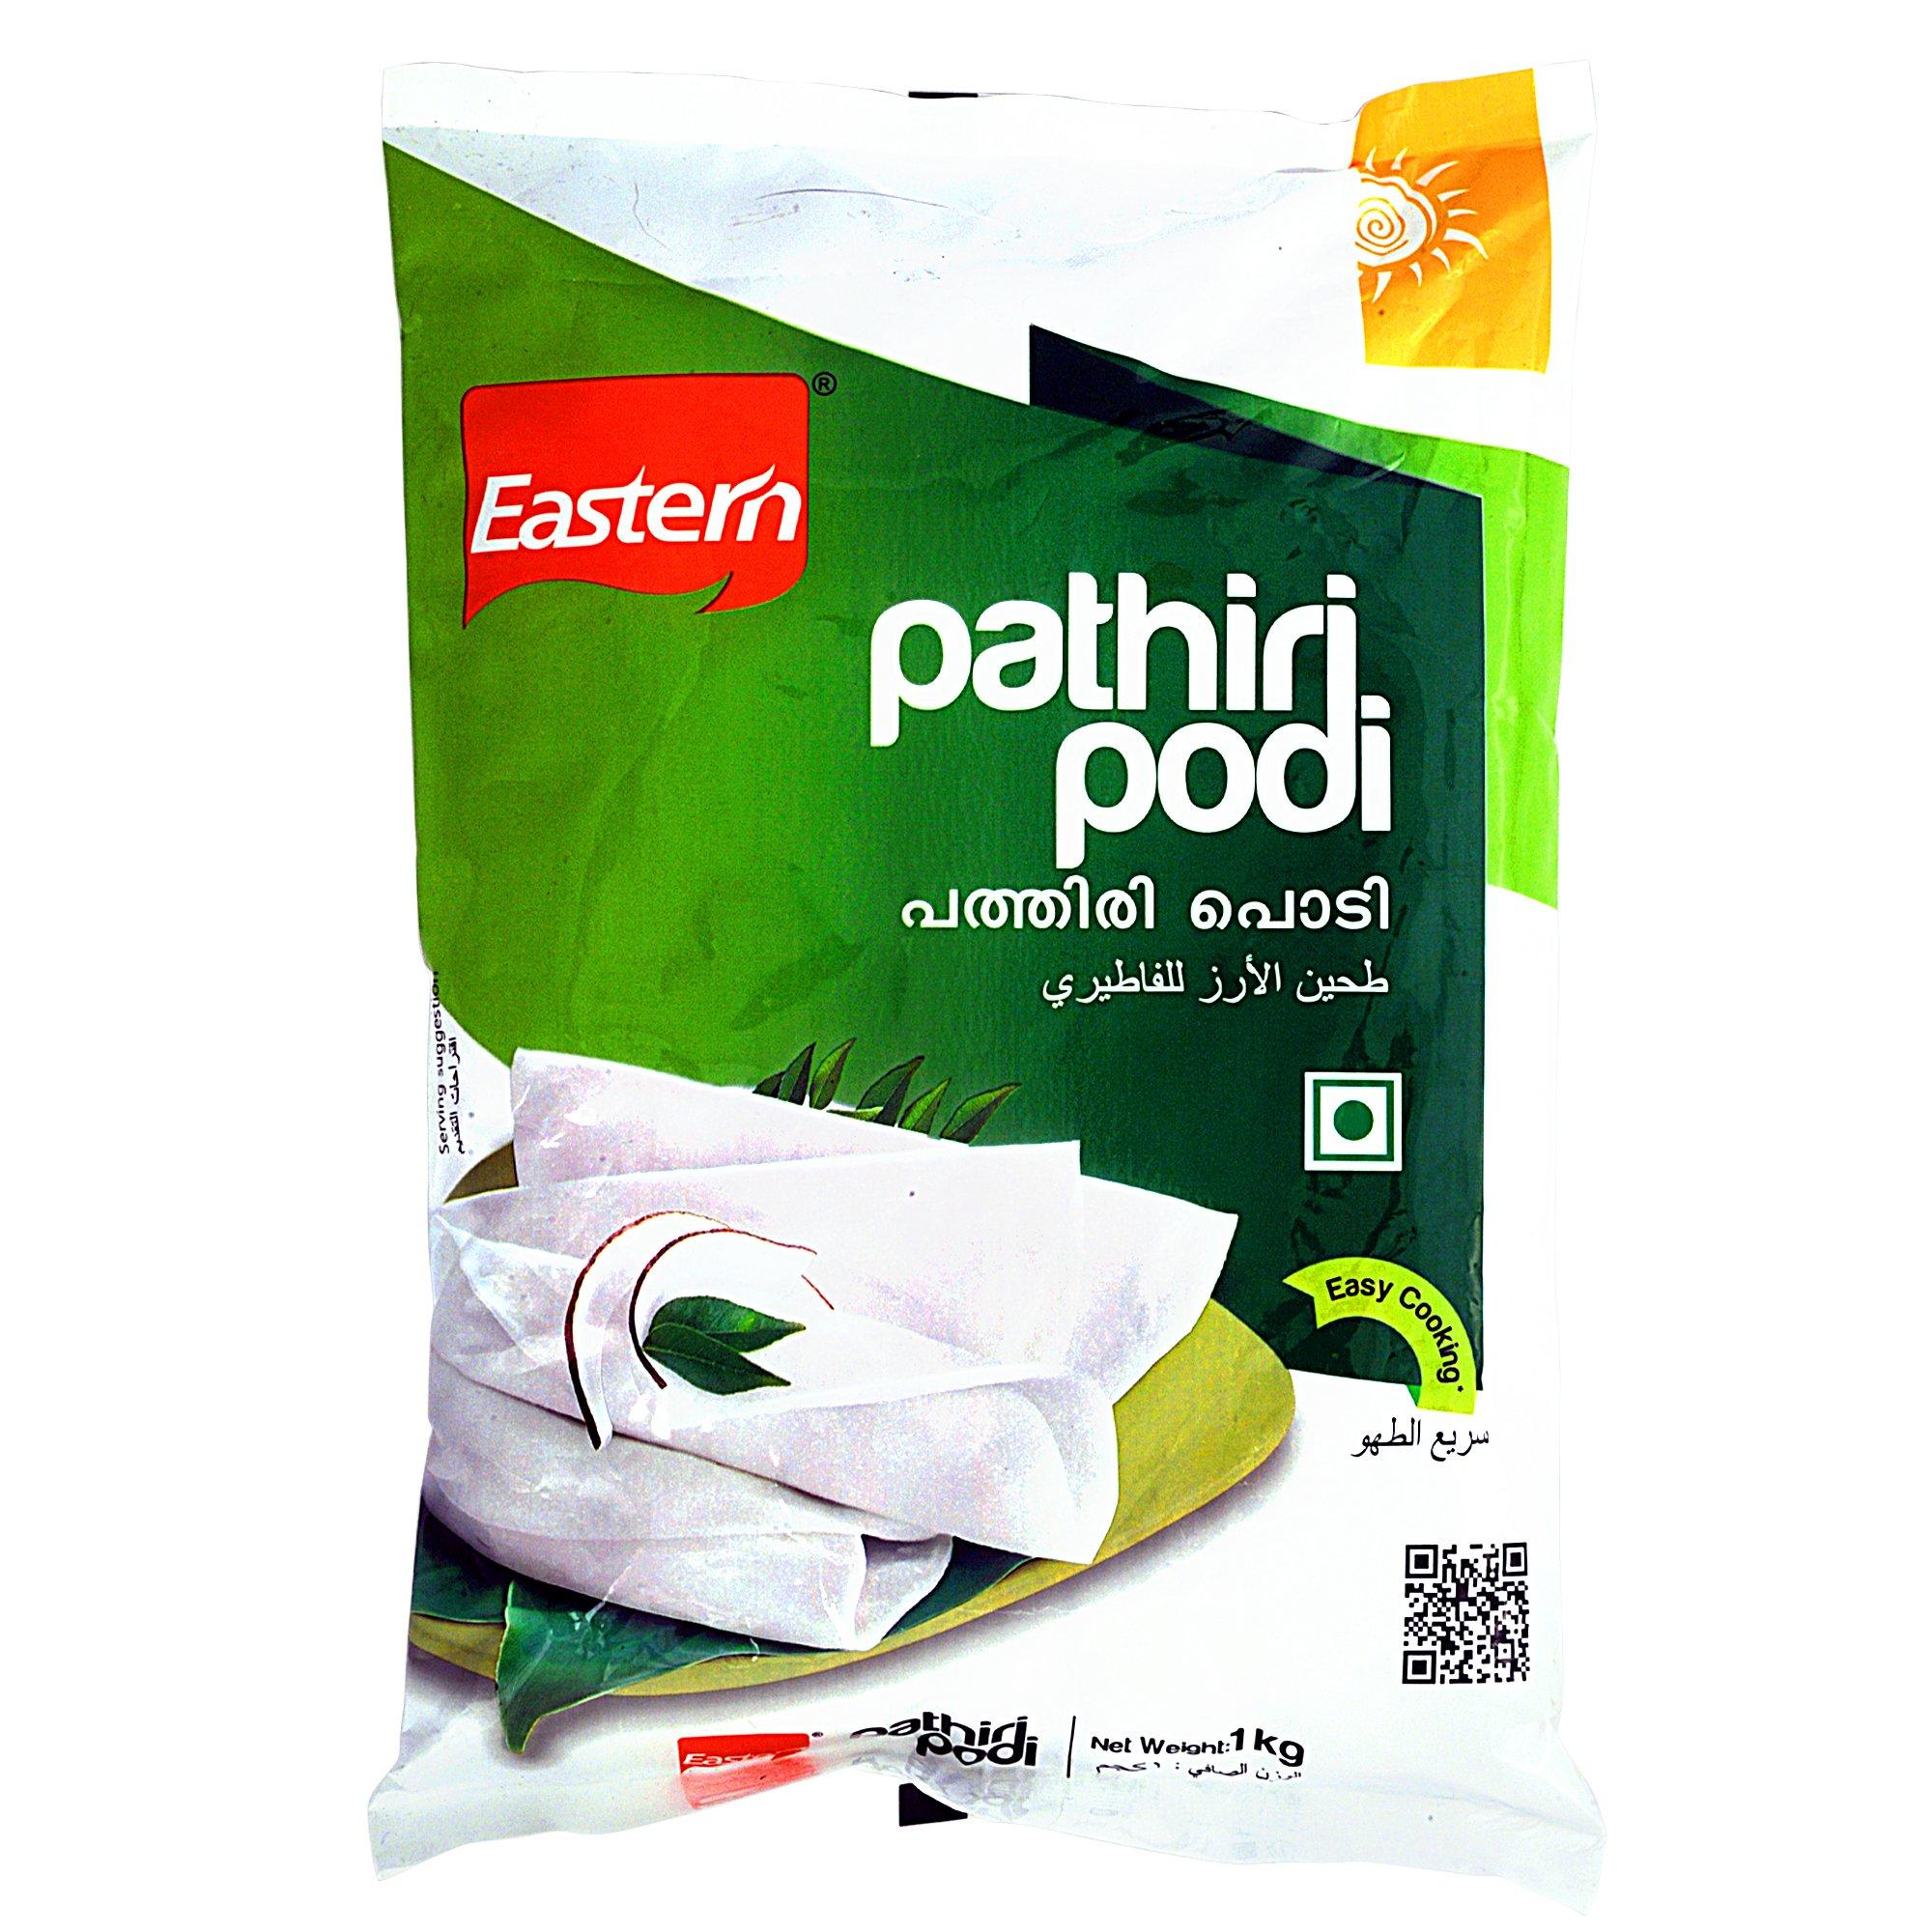 Eatern Pathiri Podi